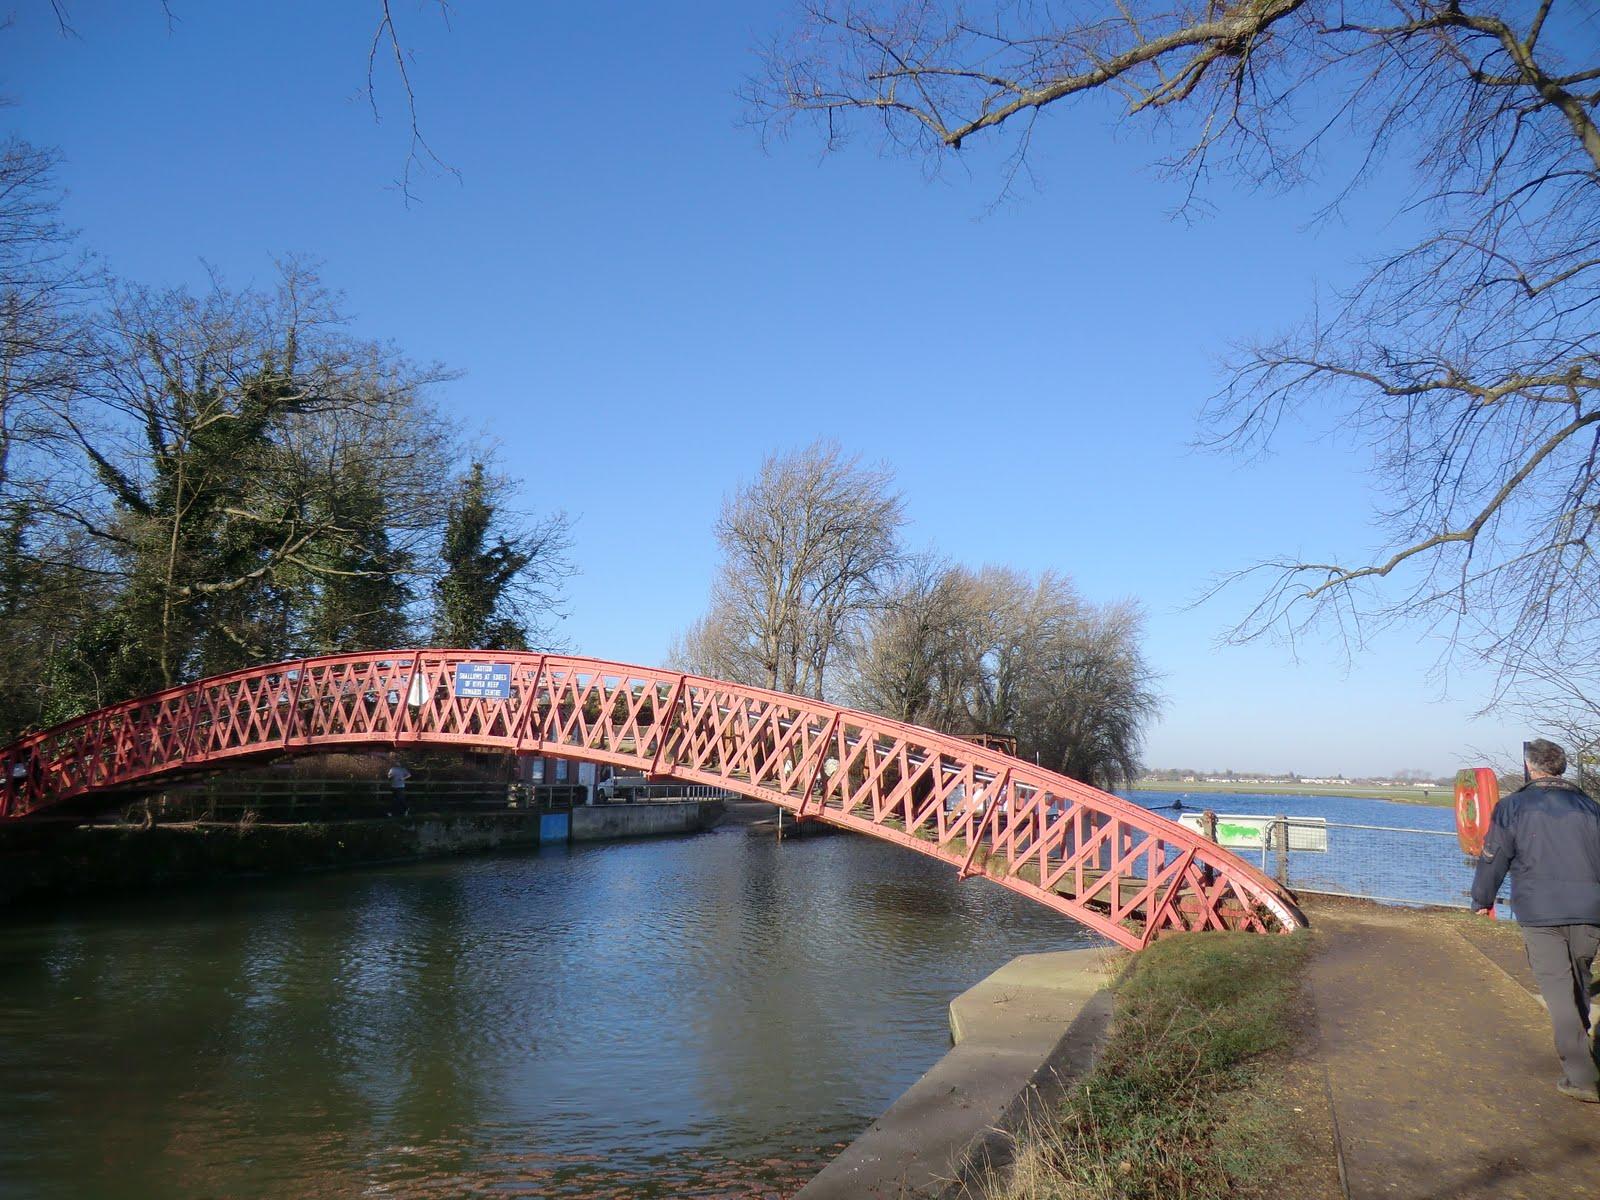 CIMG1505 Footbridge over the River Isis